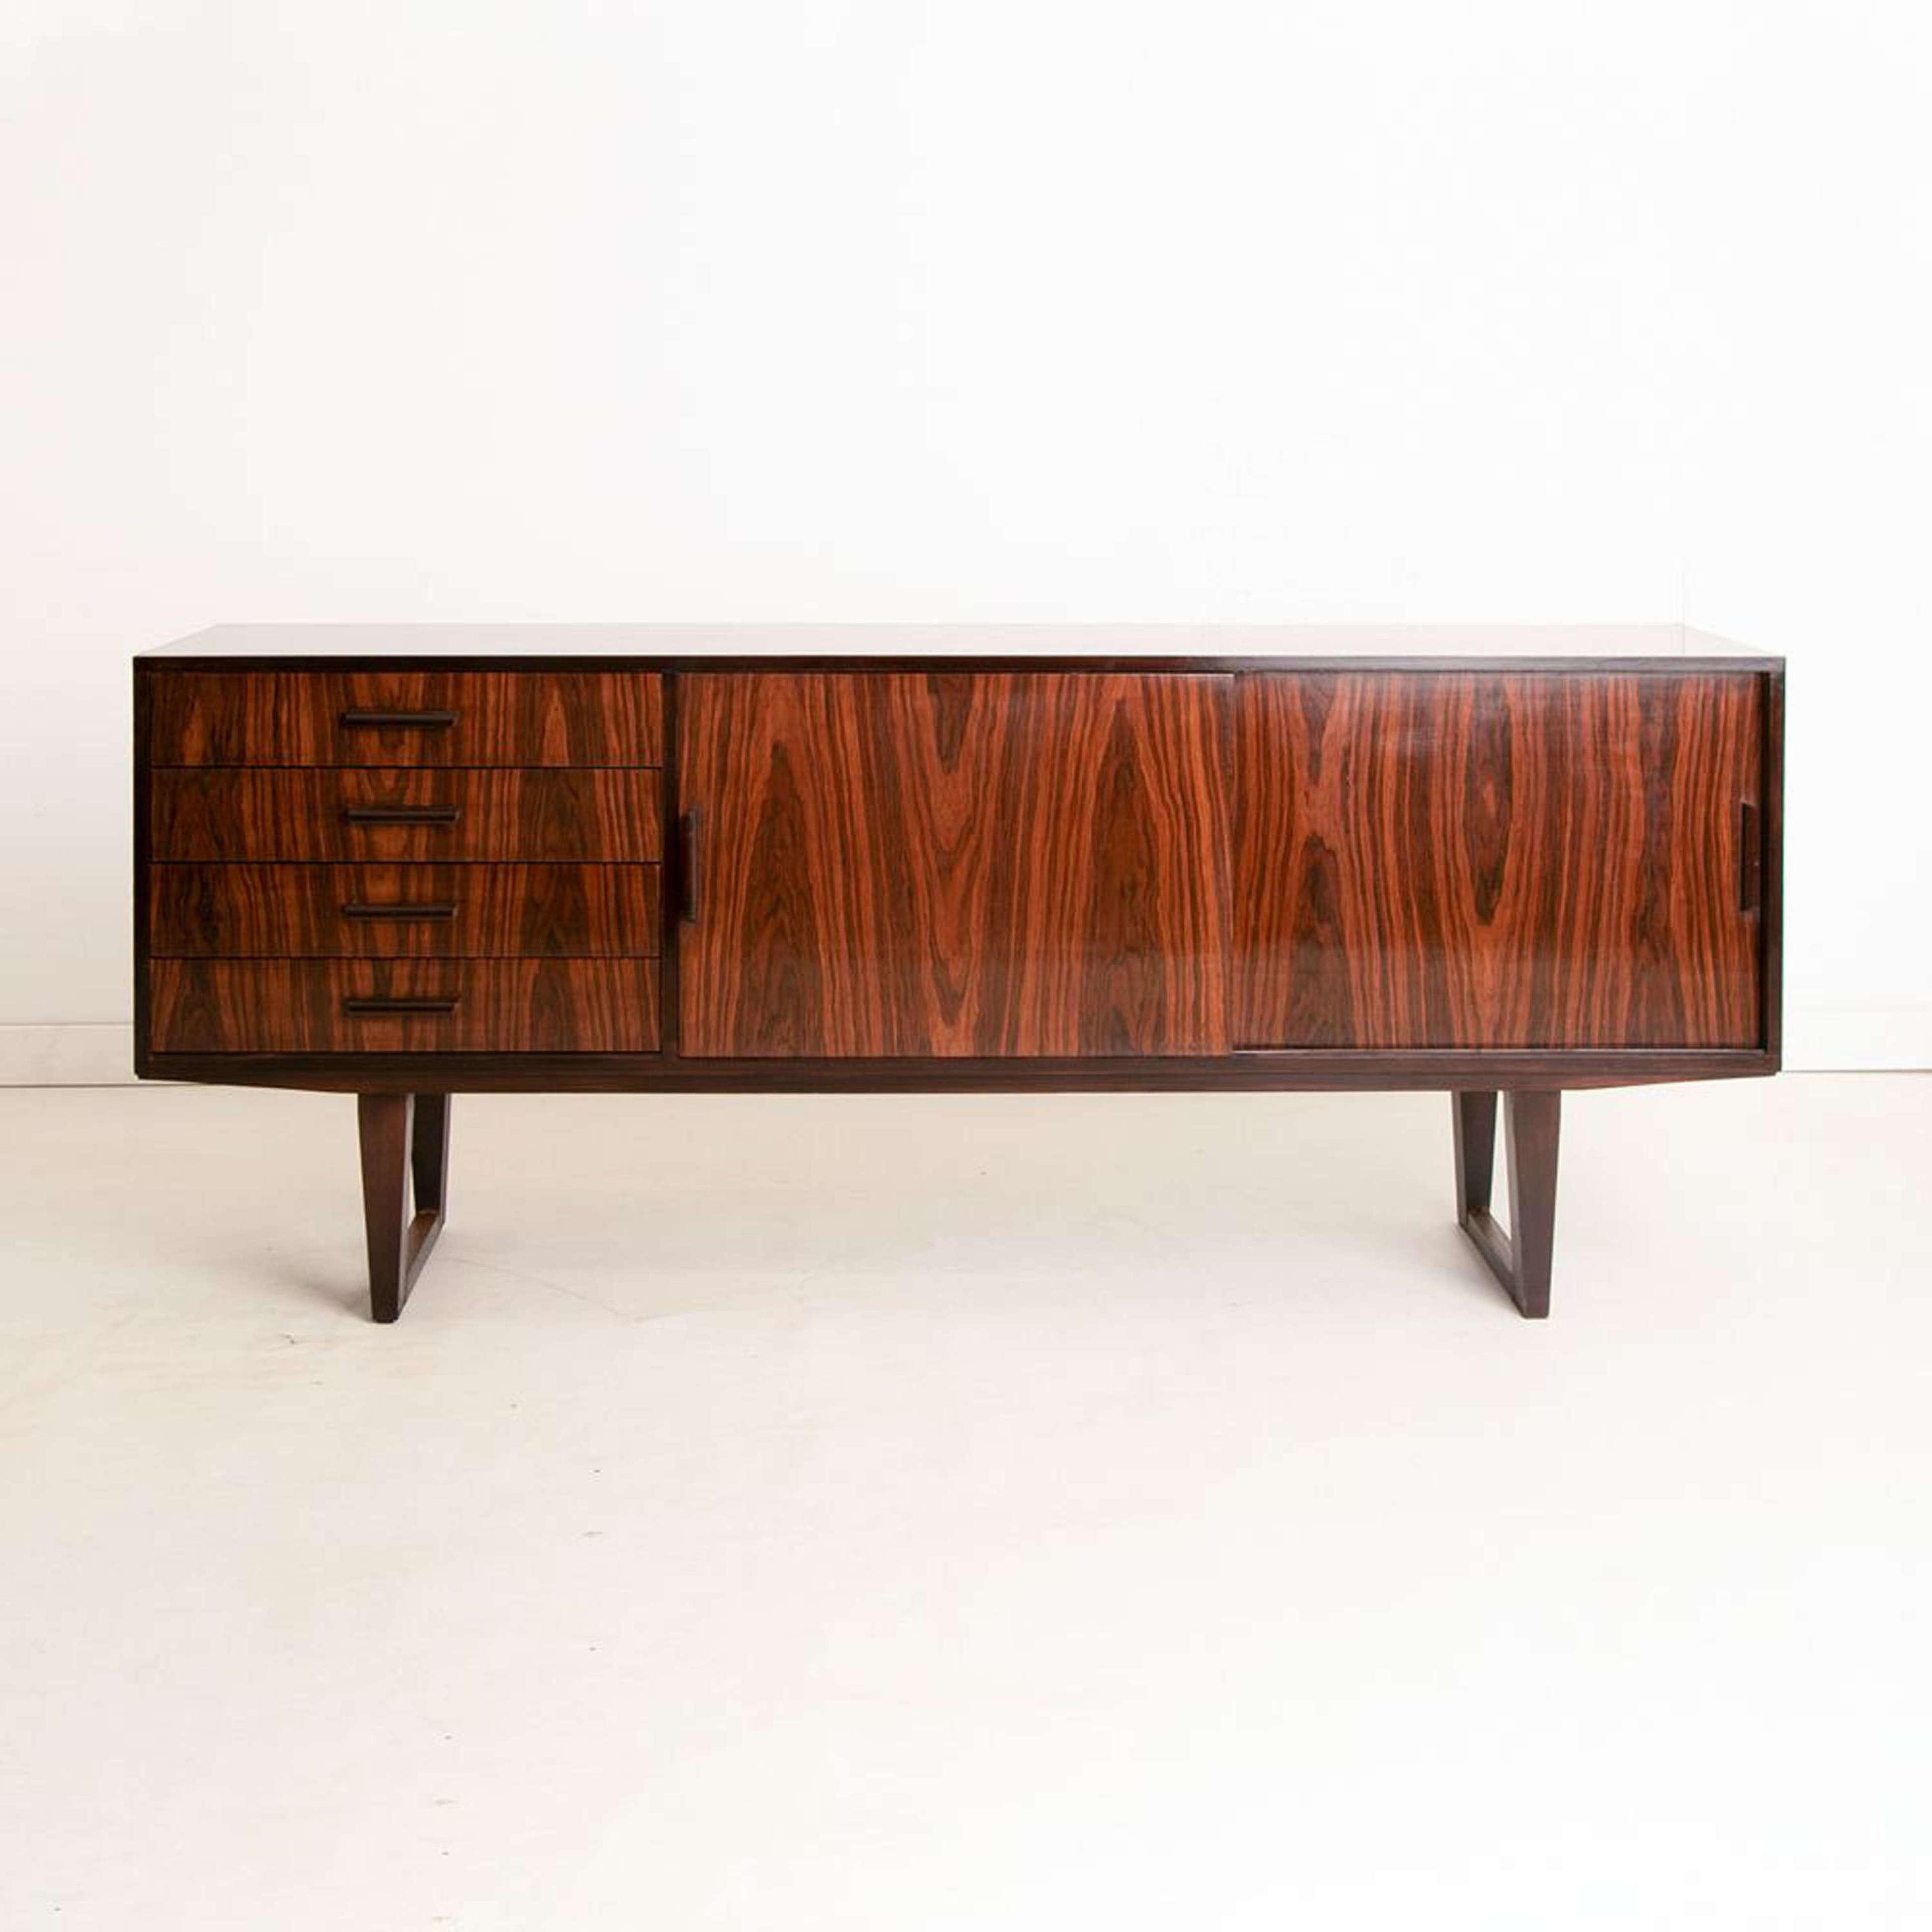 Danish Midcentury Rosewood Sideboard c.1968